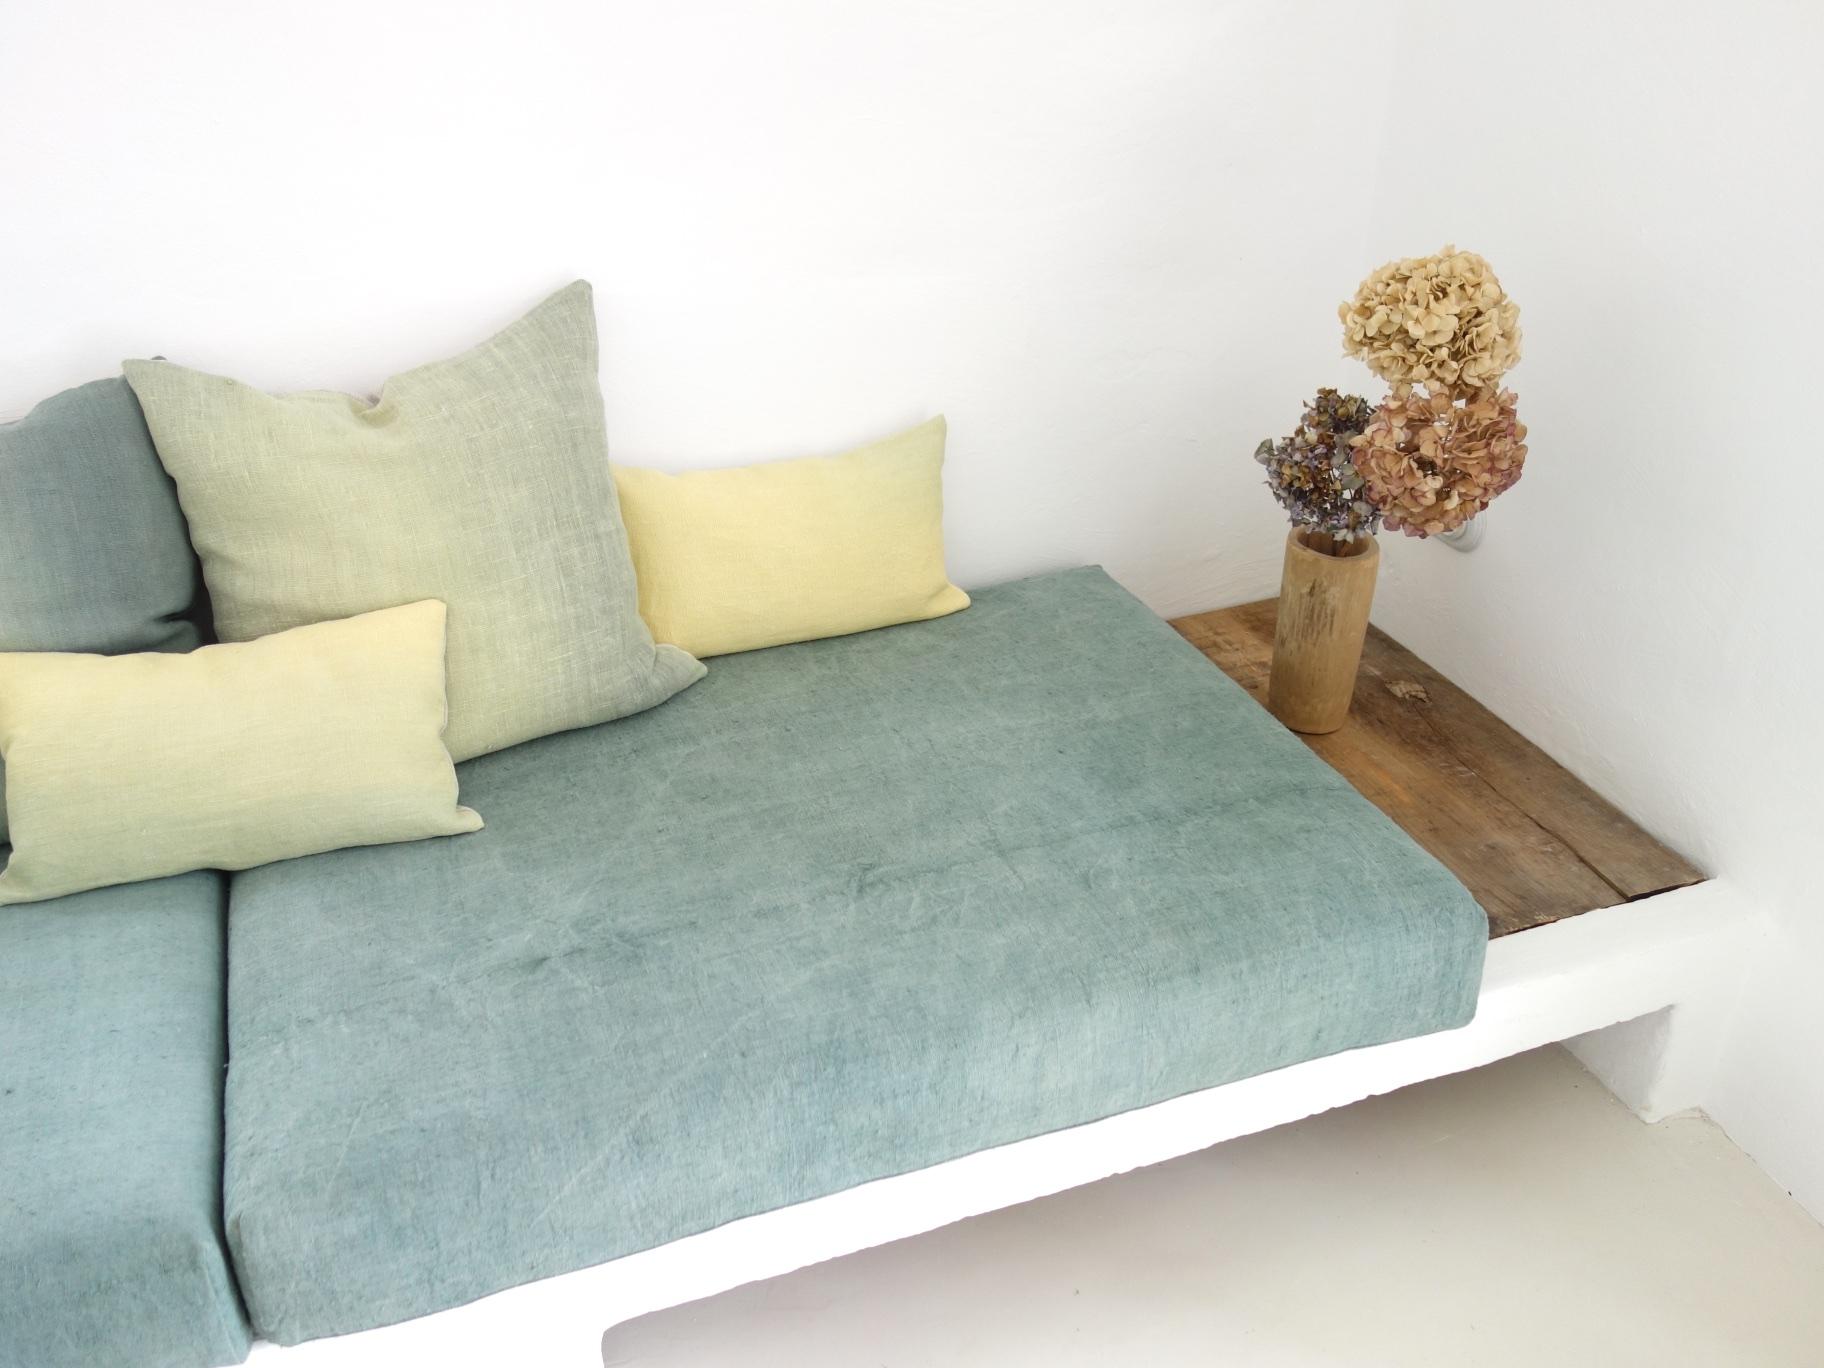 espanyolet_vintage_hemp_linen_couch_corner_green6.jpg